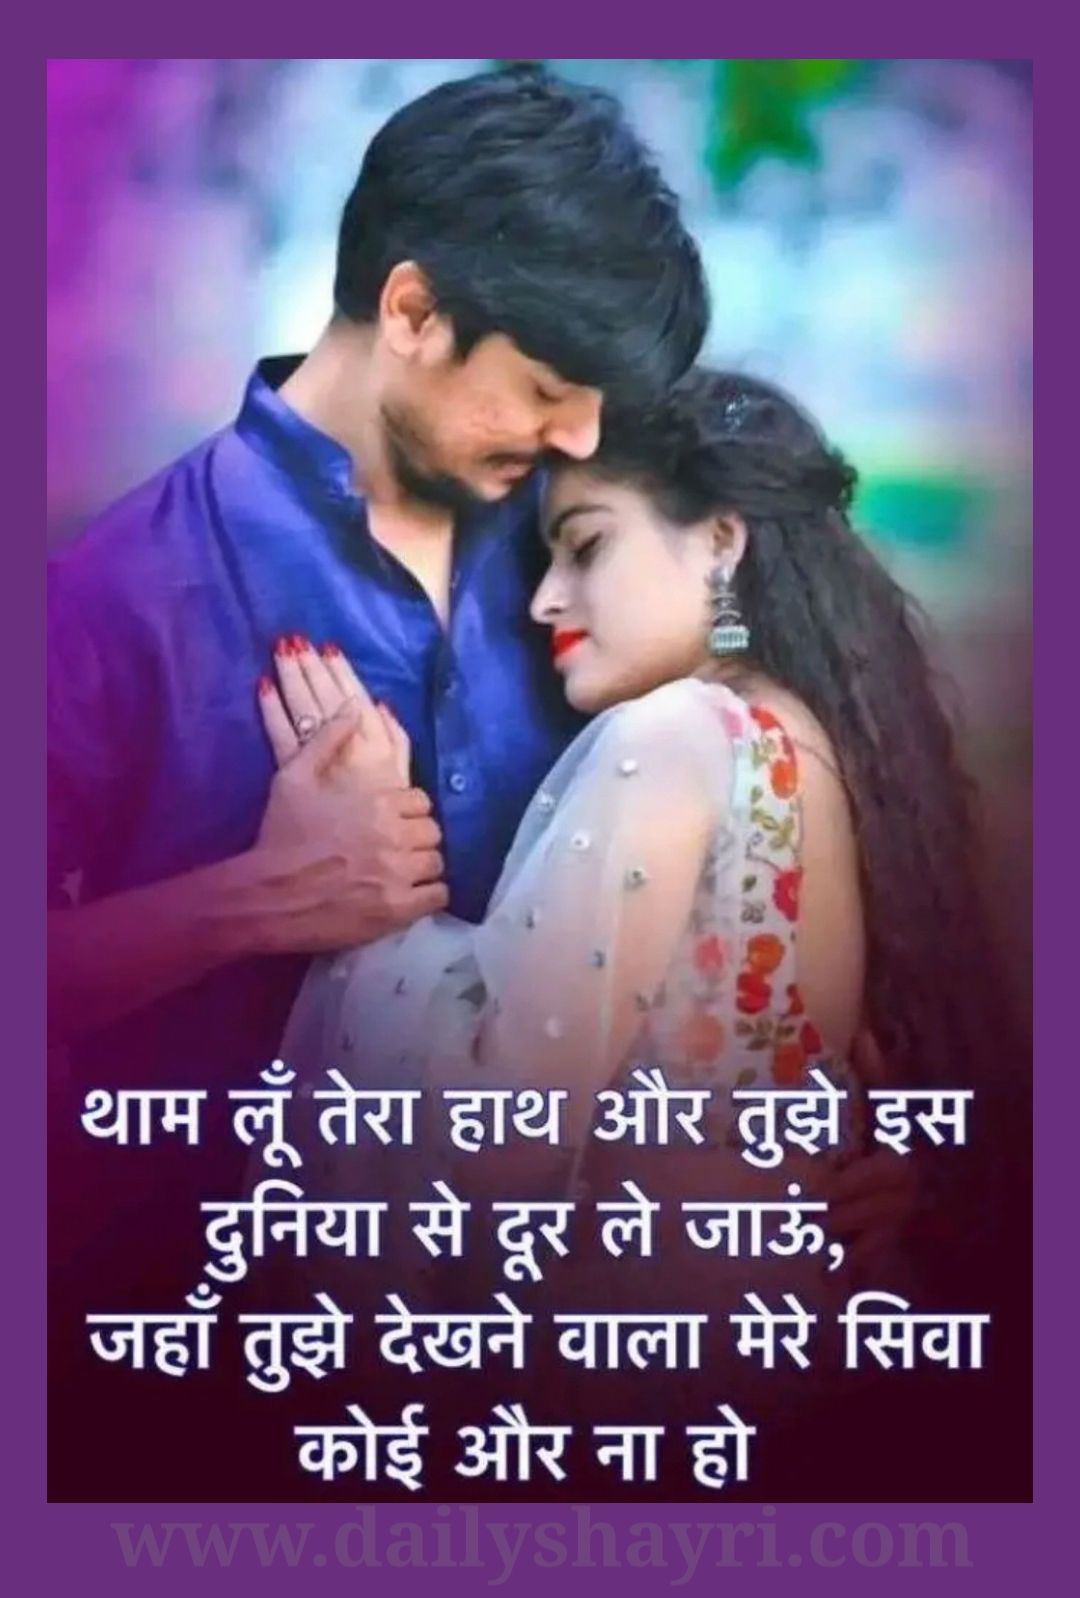 Bewafa Shayari in Hindi for girlfriend in 2020 (With